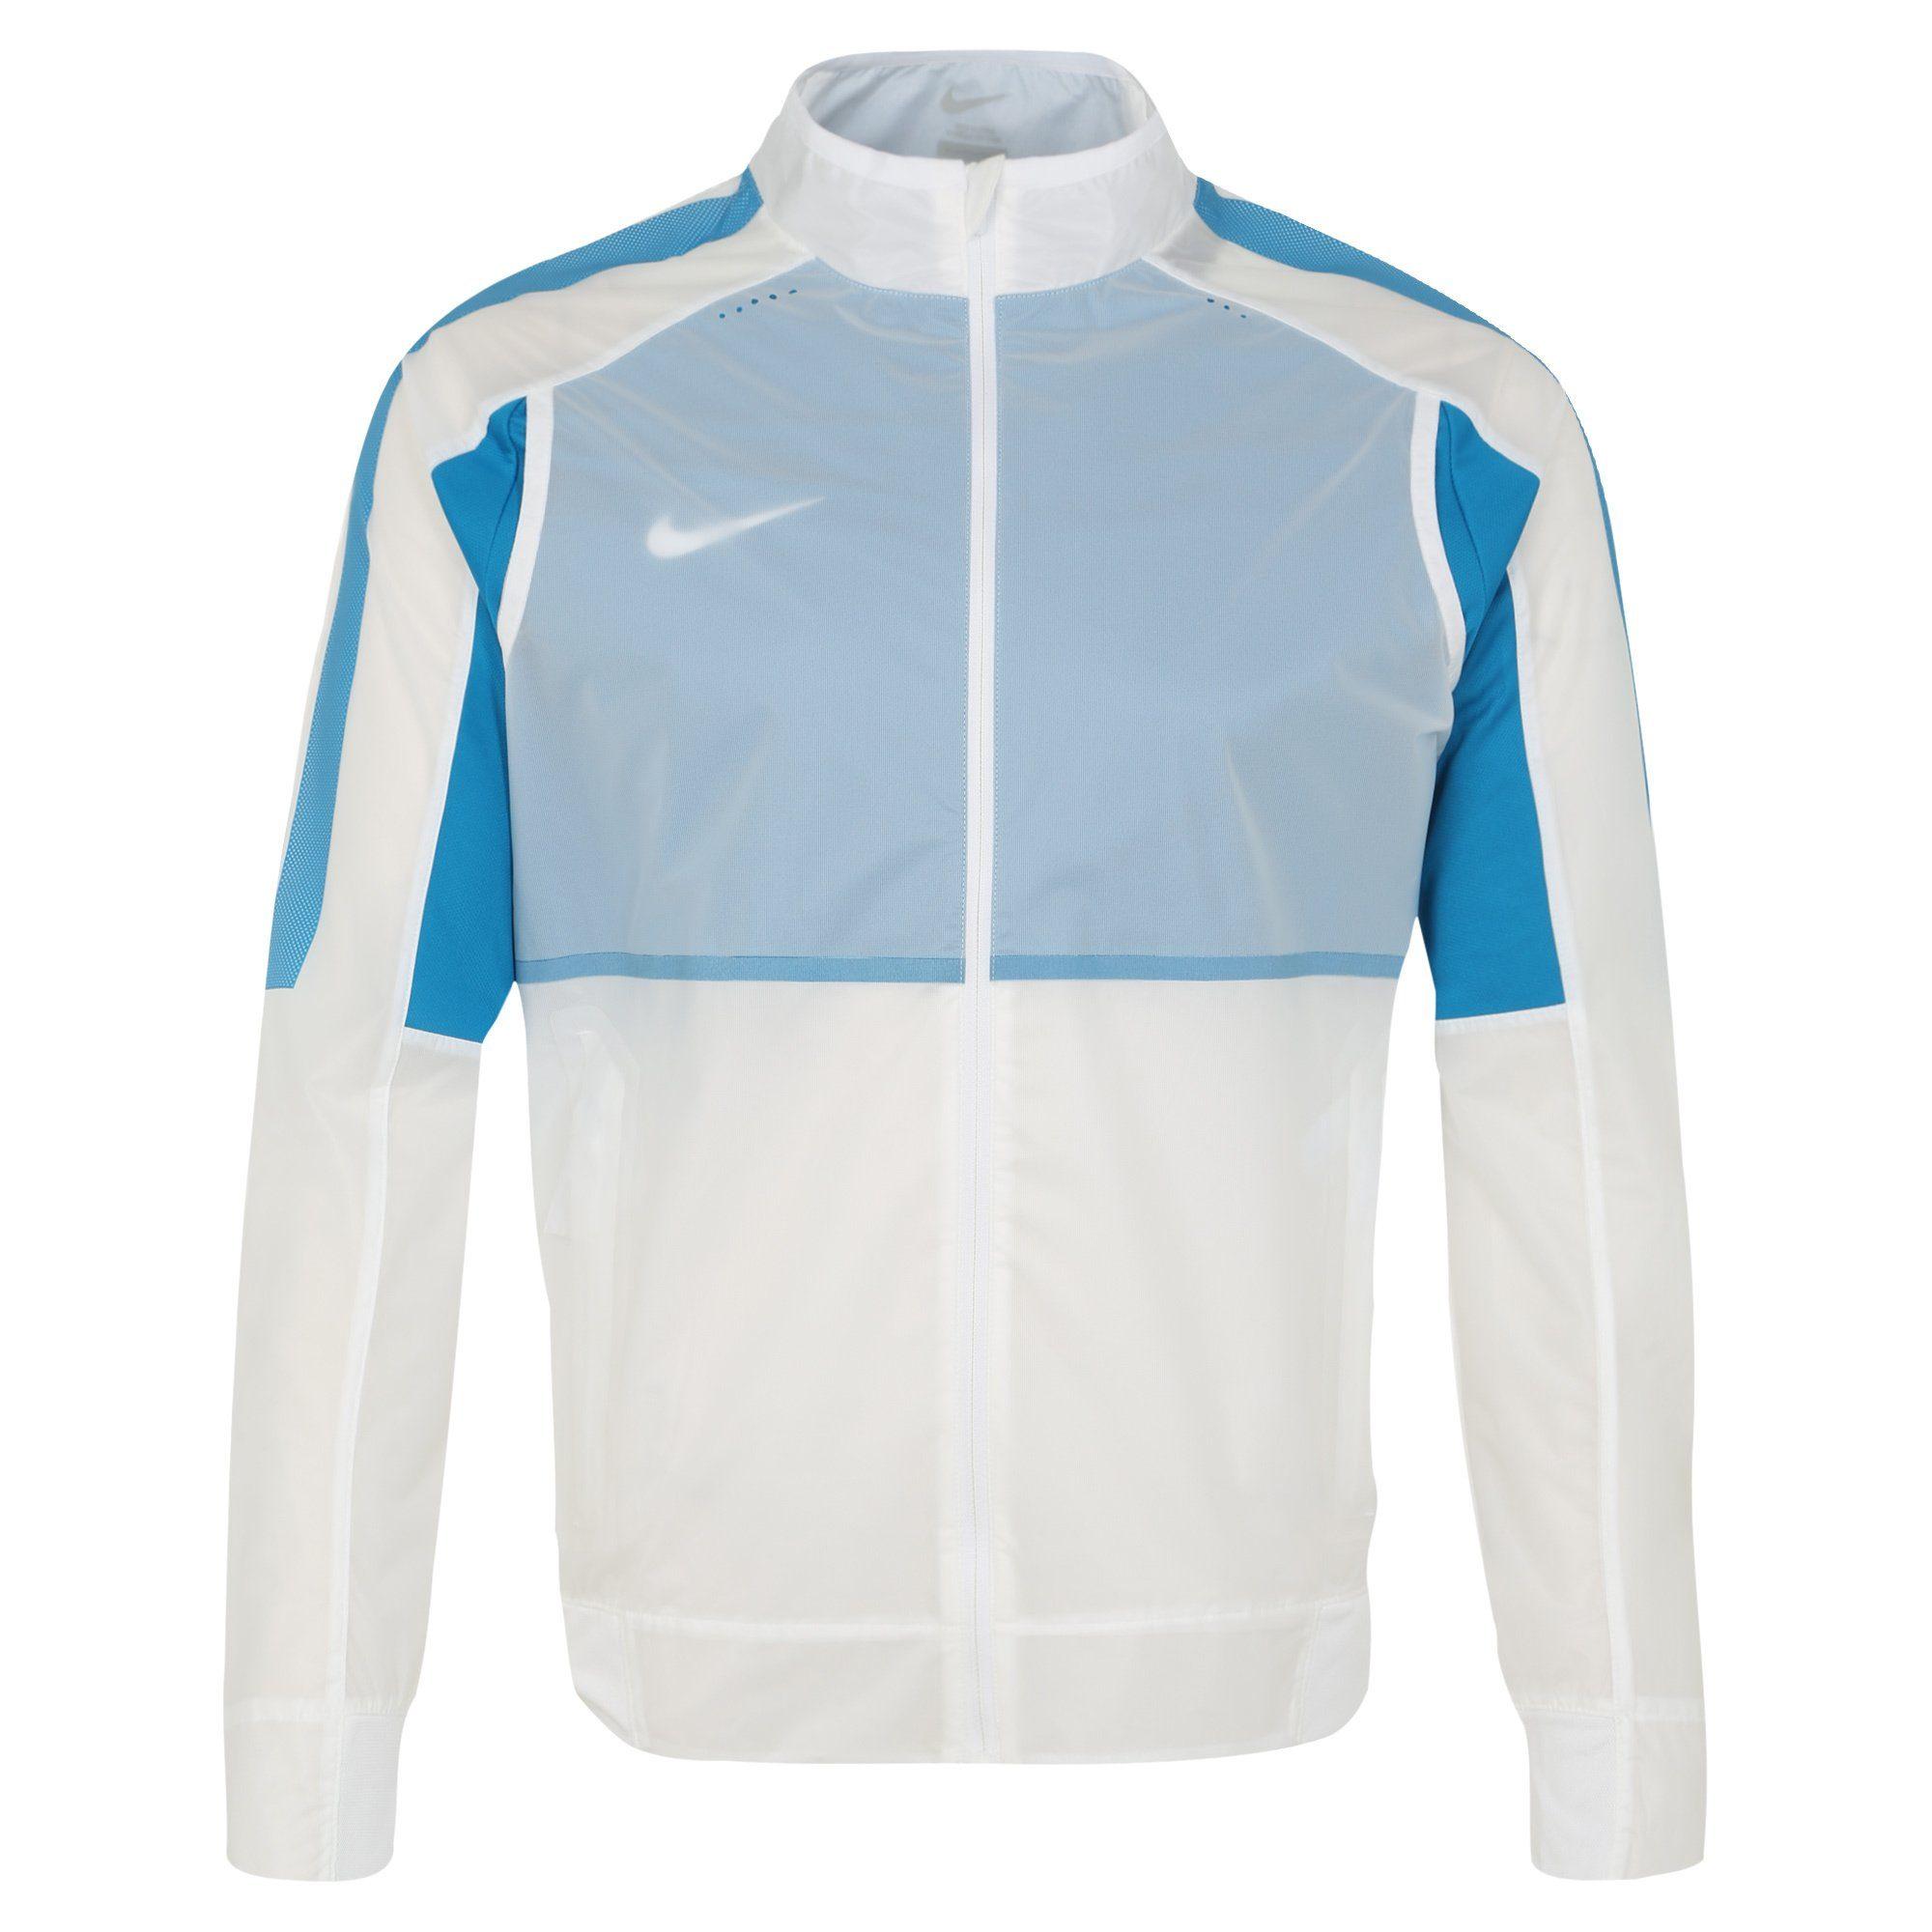 Nike Trainingsjacke Nike Select Revolution Trainingsjacke Herren | Sportbekleidung > Sportjacken > Trainingsjacken | Weiß | Nike